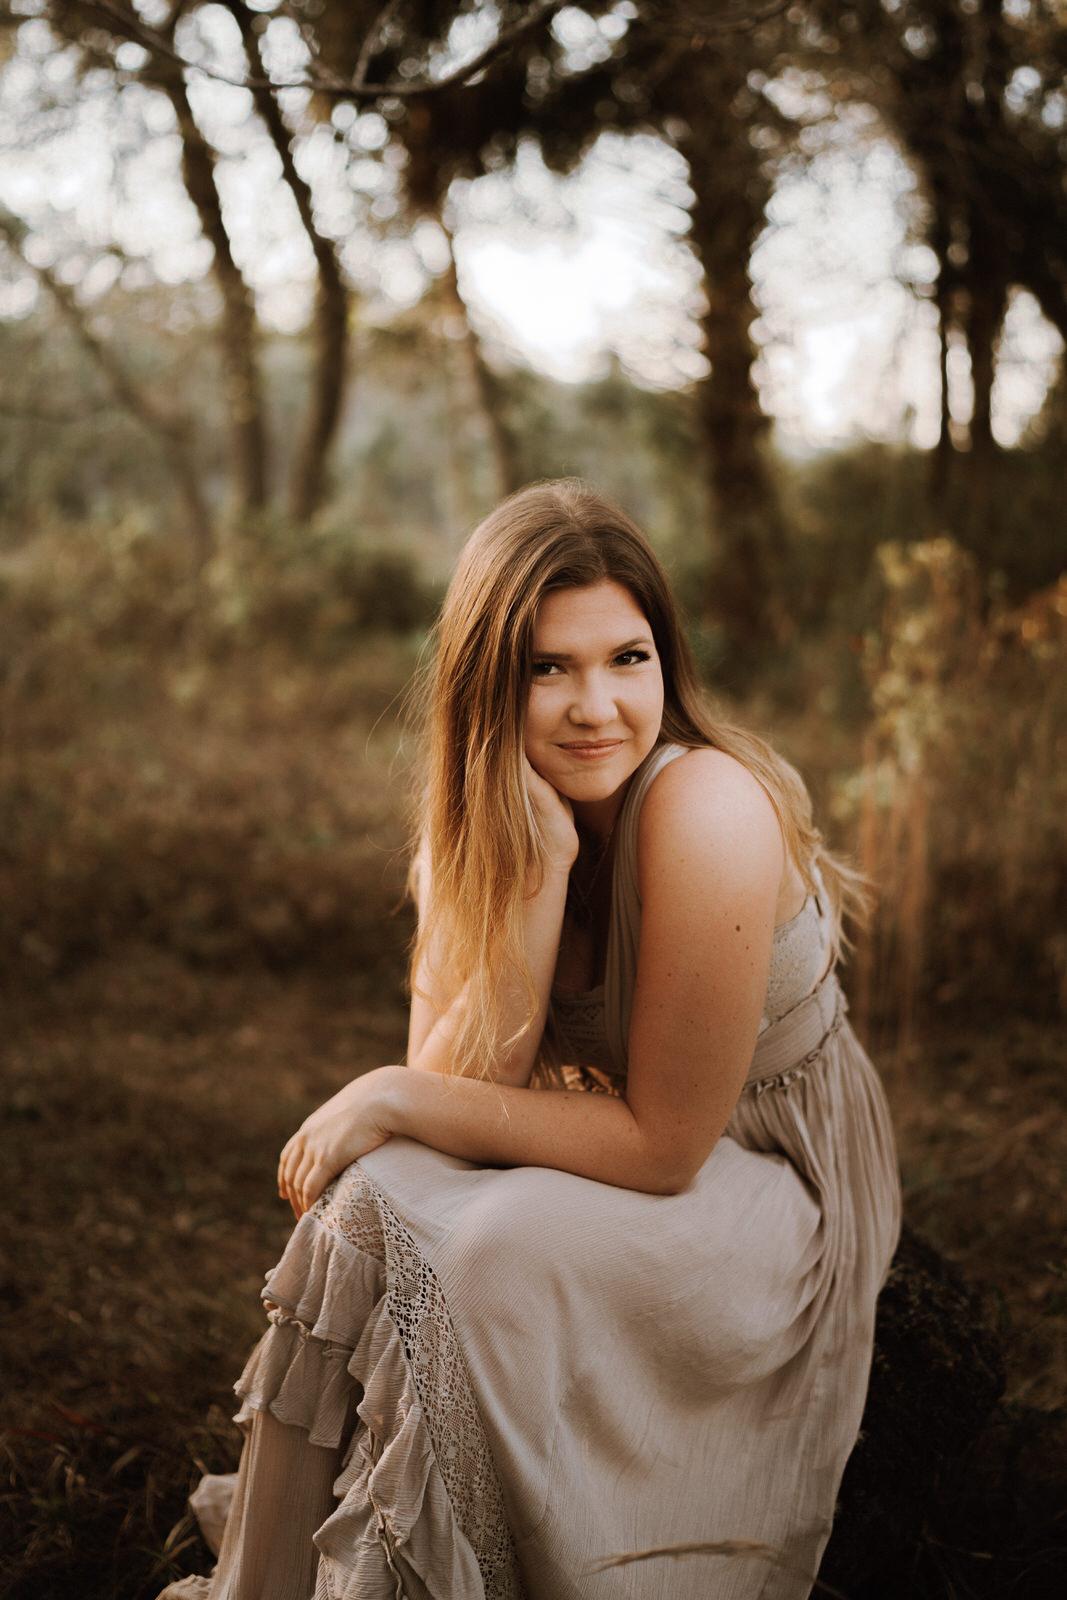 Fort Myers Senior Photos- Michelle Gonzalez Photography- Kristen Harder-119.JPG